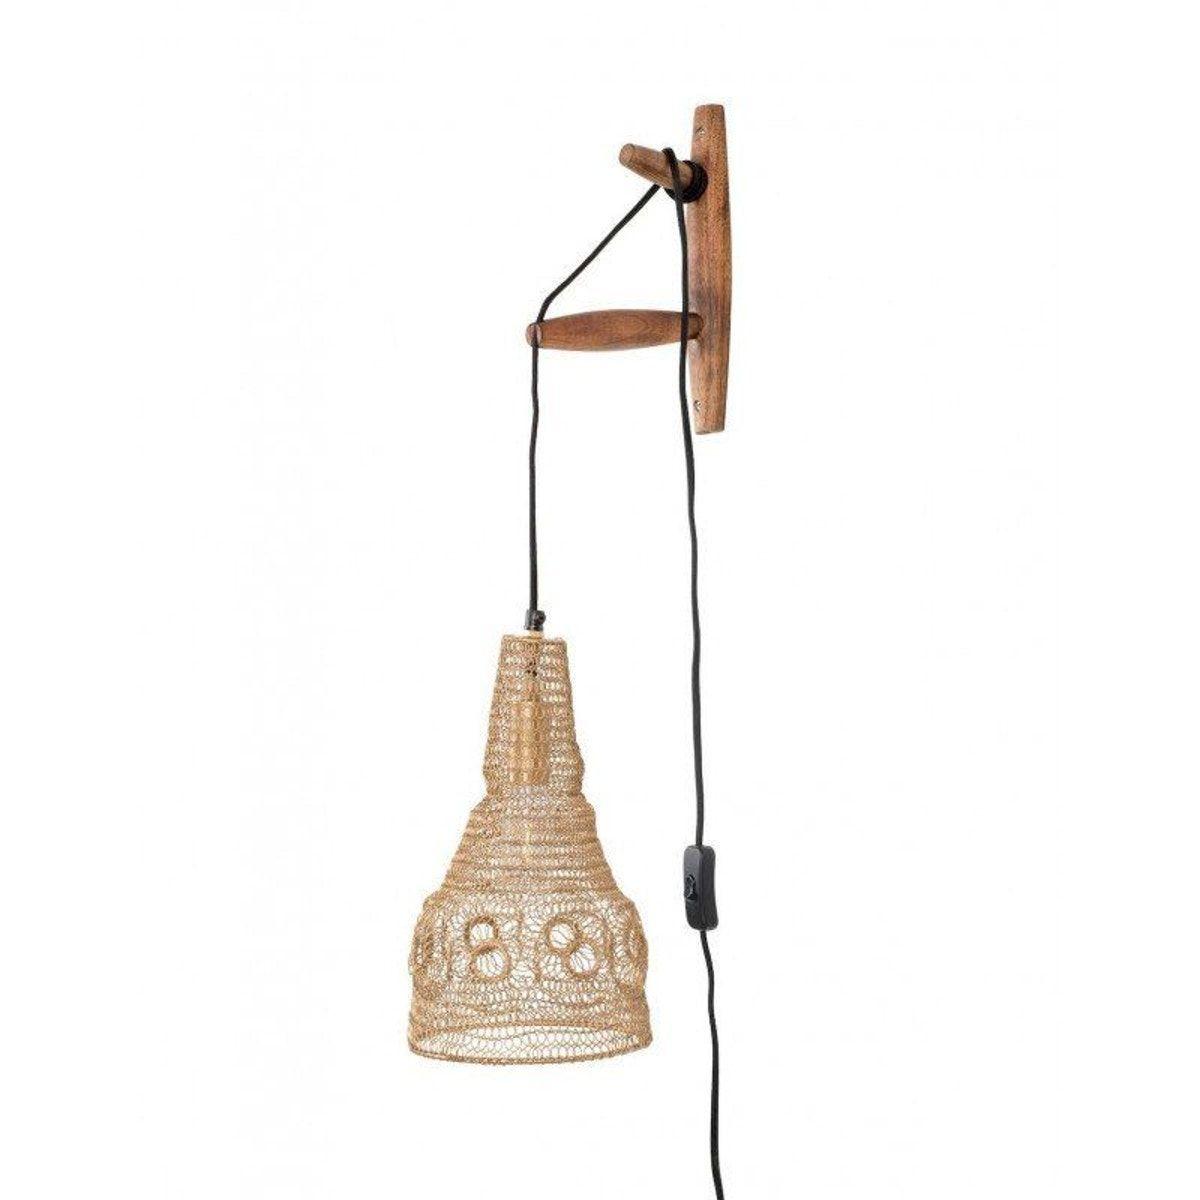 Lampe Murale Suspendu En Metal Maille Alen Boite A Design En 2020 Lampe Murale Parement Mural Lamp